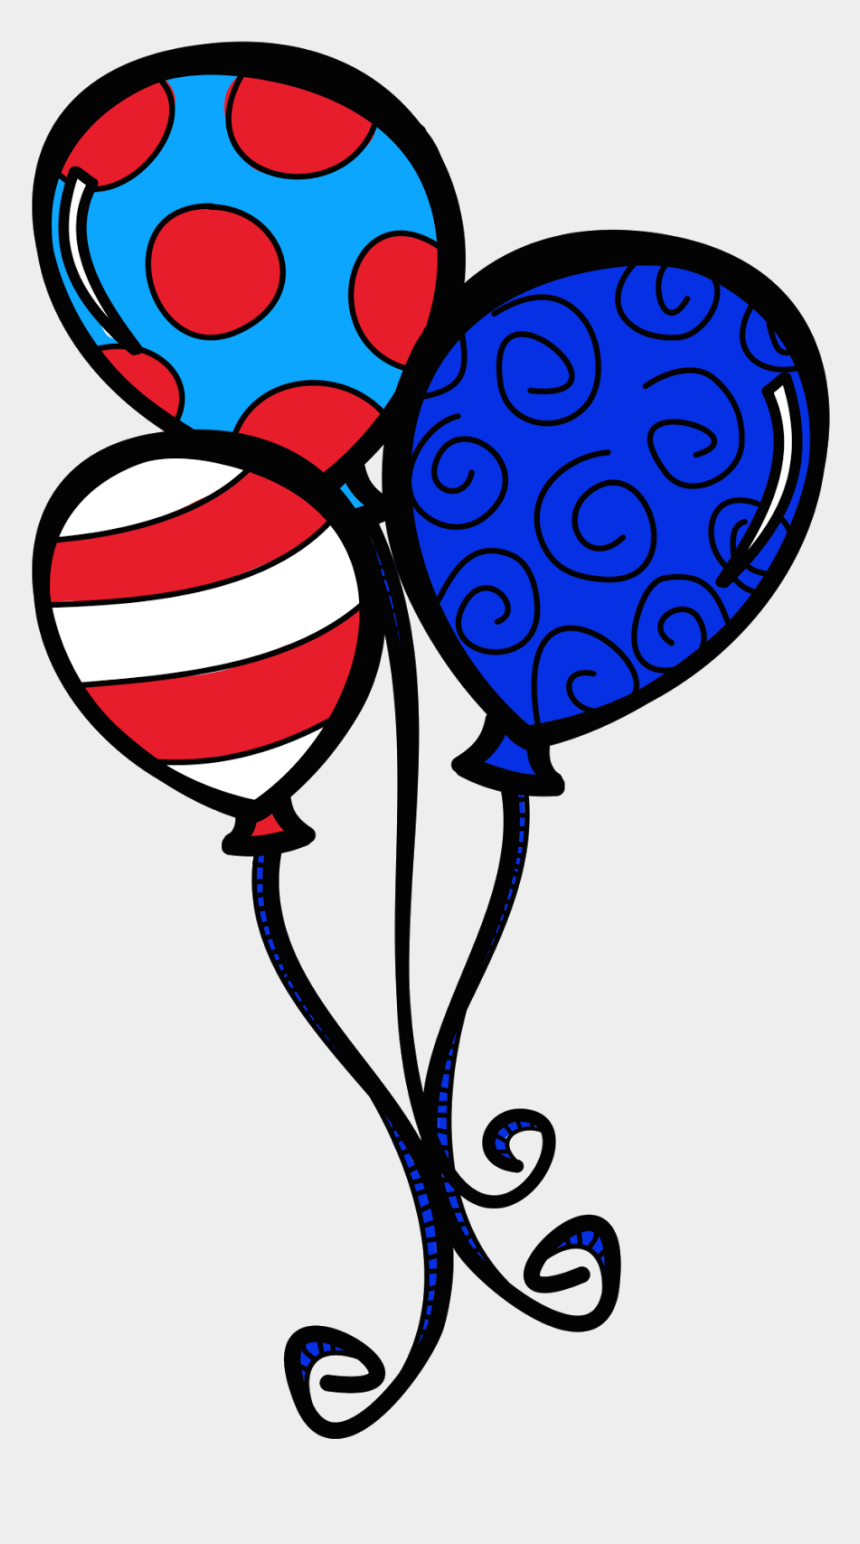 balloon clipart, Cartoons - Dr Seuss Balloon Clipart - Happy Birthday Dr Seuss Balloons